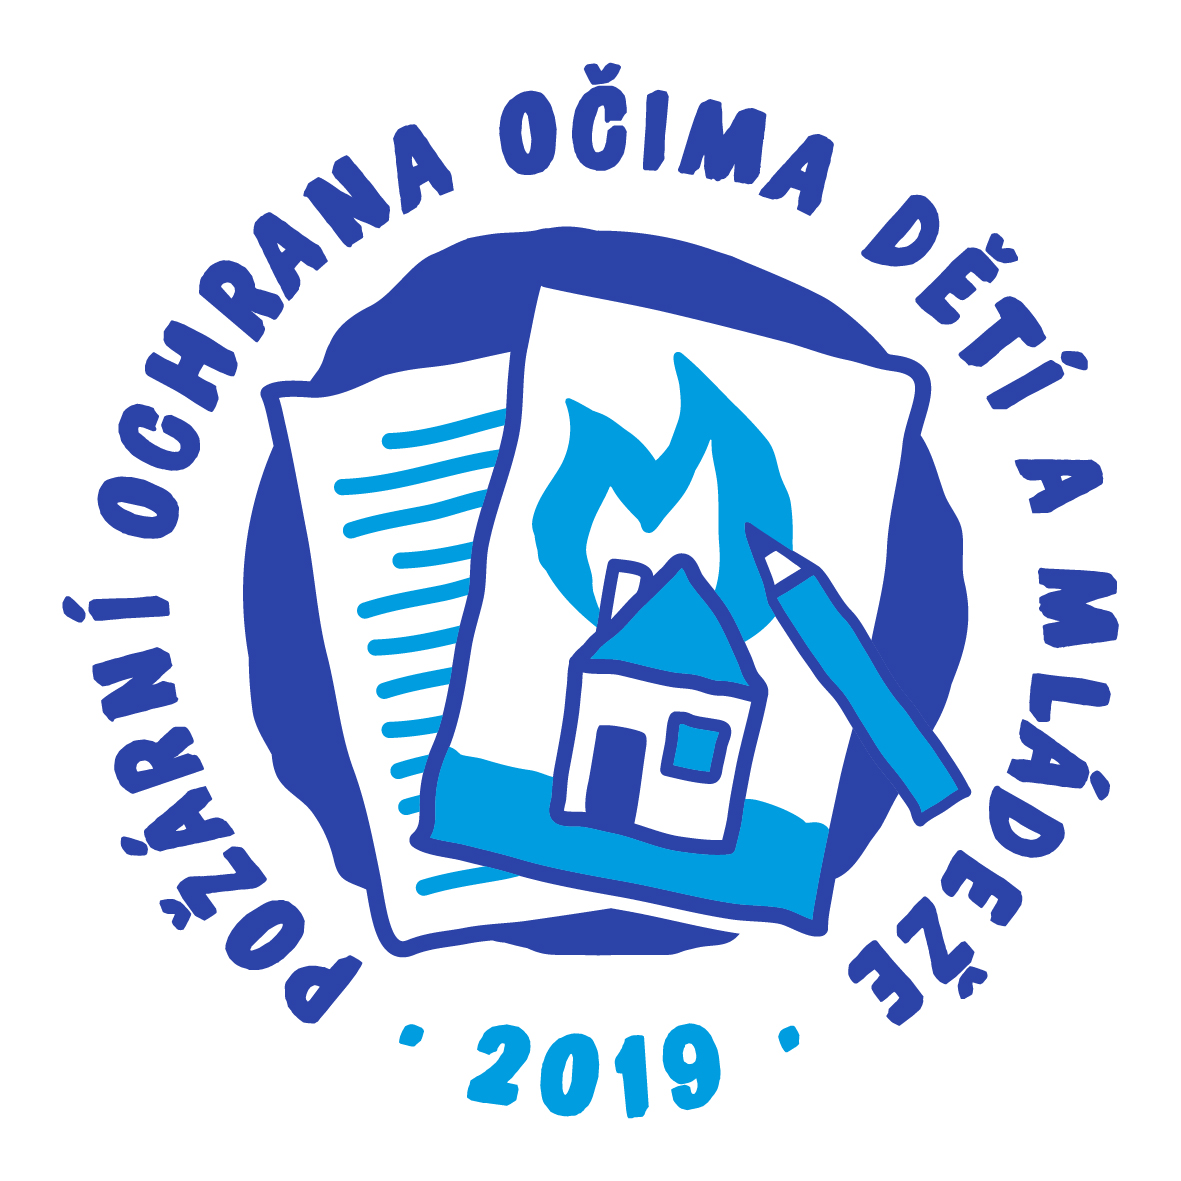 https://www.osh-pt.cz/wp-content/files/mladi_hasici_ostatni/logo_POOD_2019_barva.jpg